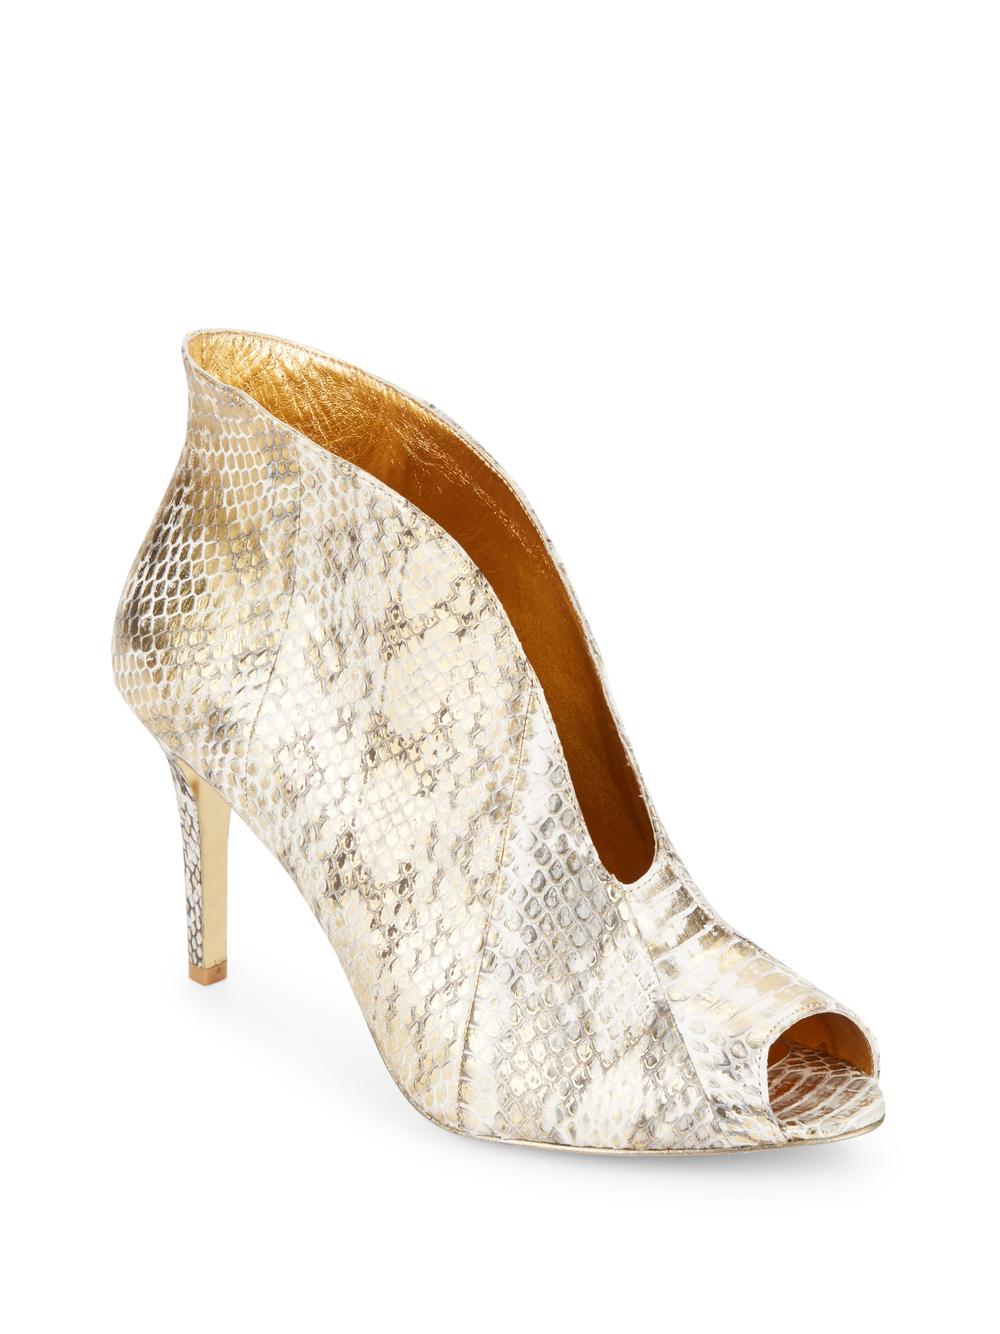 Shoes-009.JPG